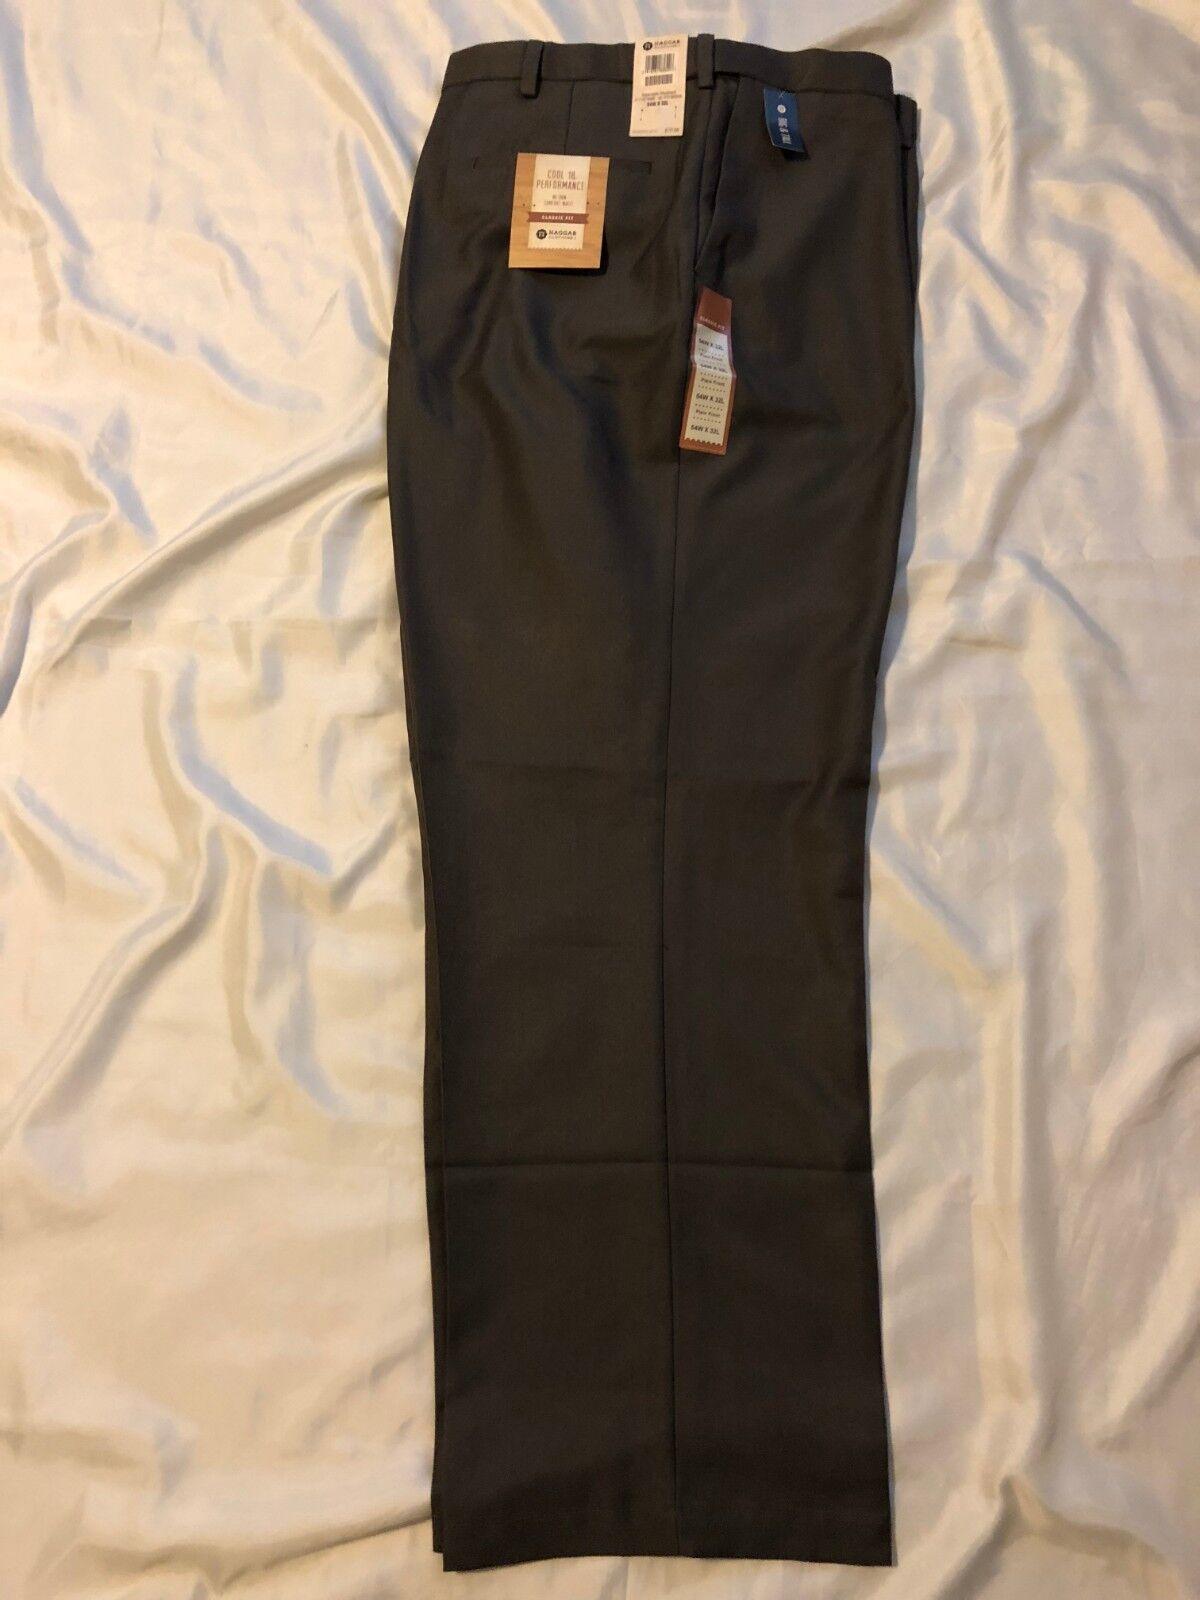 Haggar Big&Tall Trouser  Men Classic Fit, Flat Front, Expand Waist  Brwn, 54x32